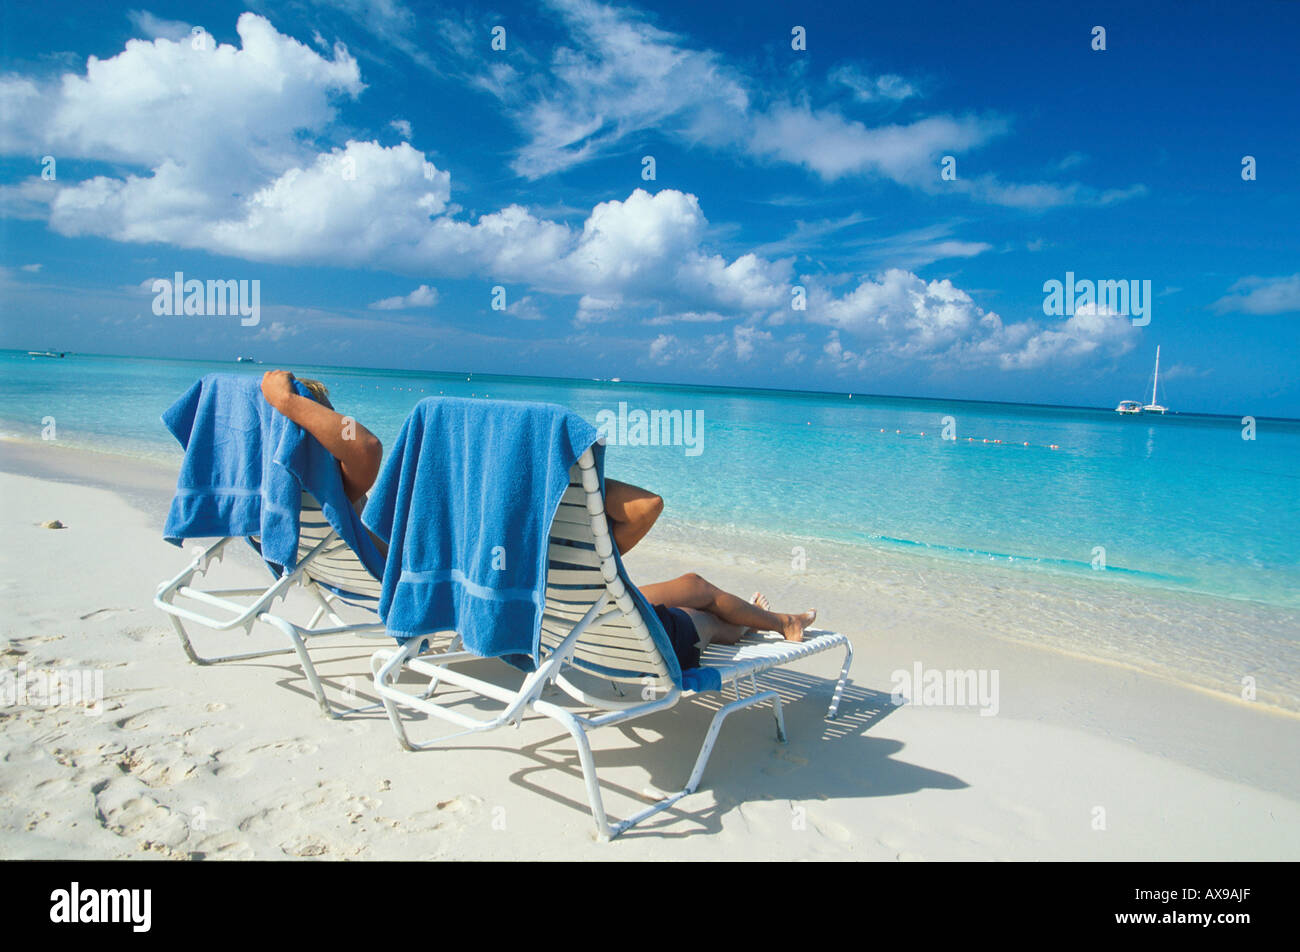 Liegestuehle am 7 Mile Beach, Grand Cayman, Cayman Islands Karibik - Stock Image